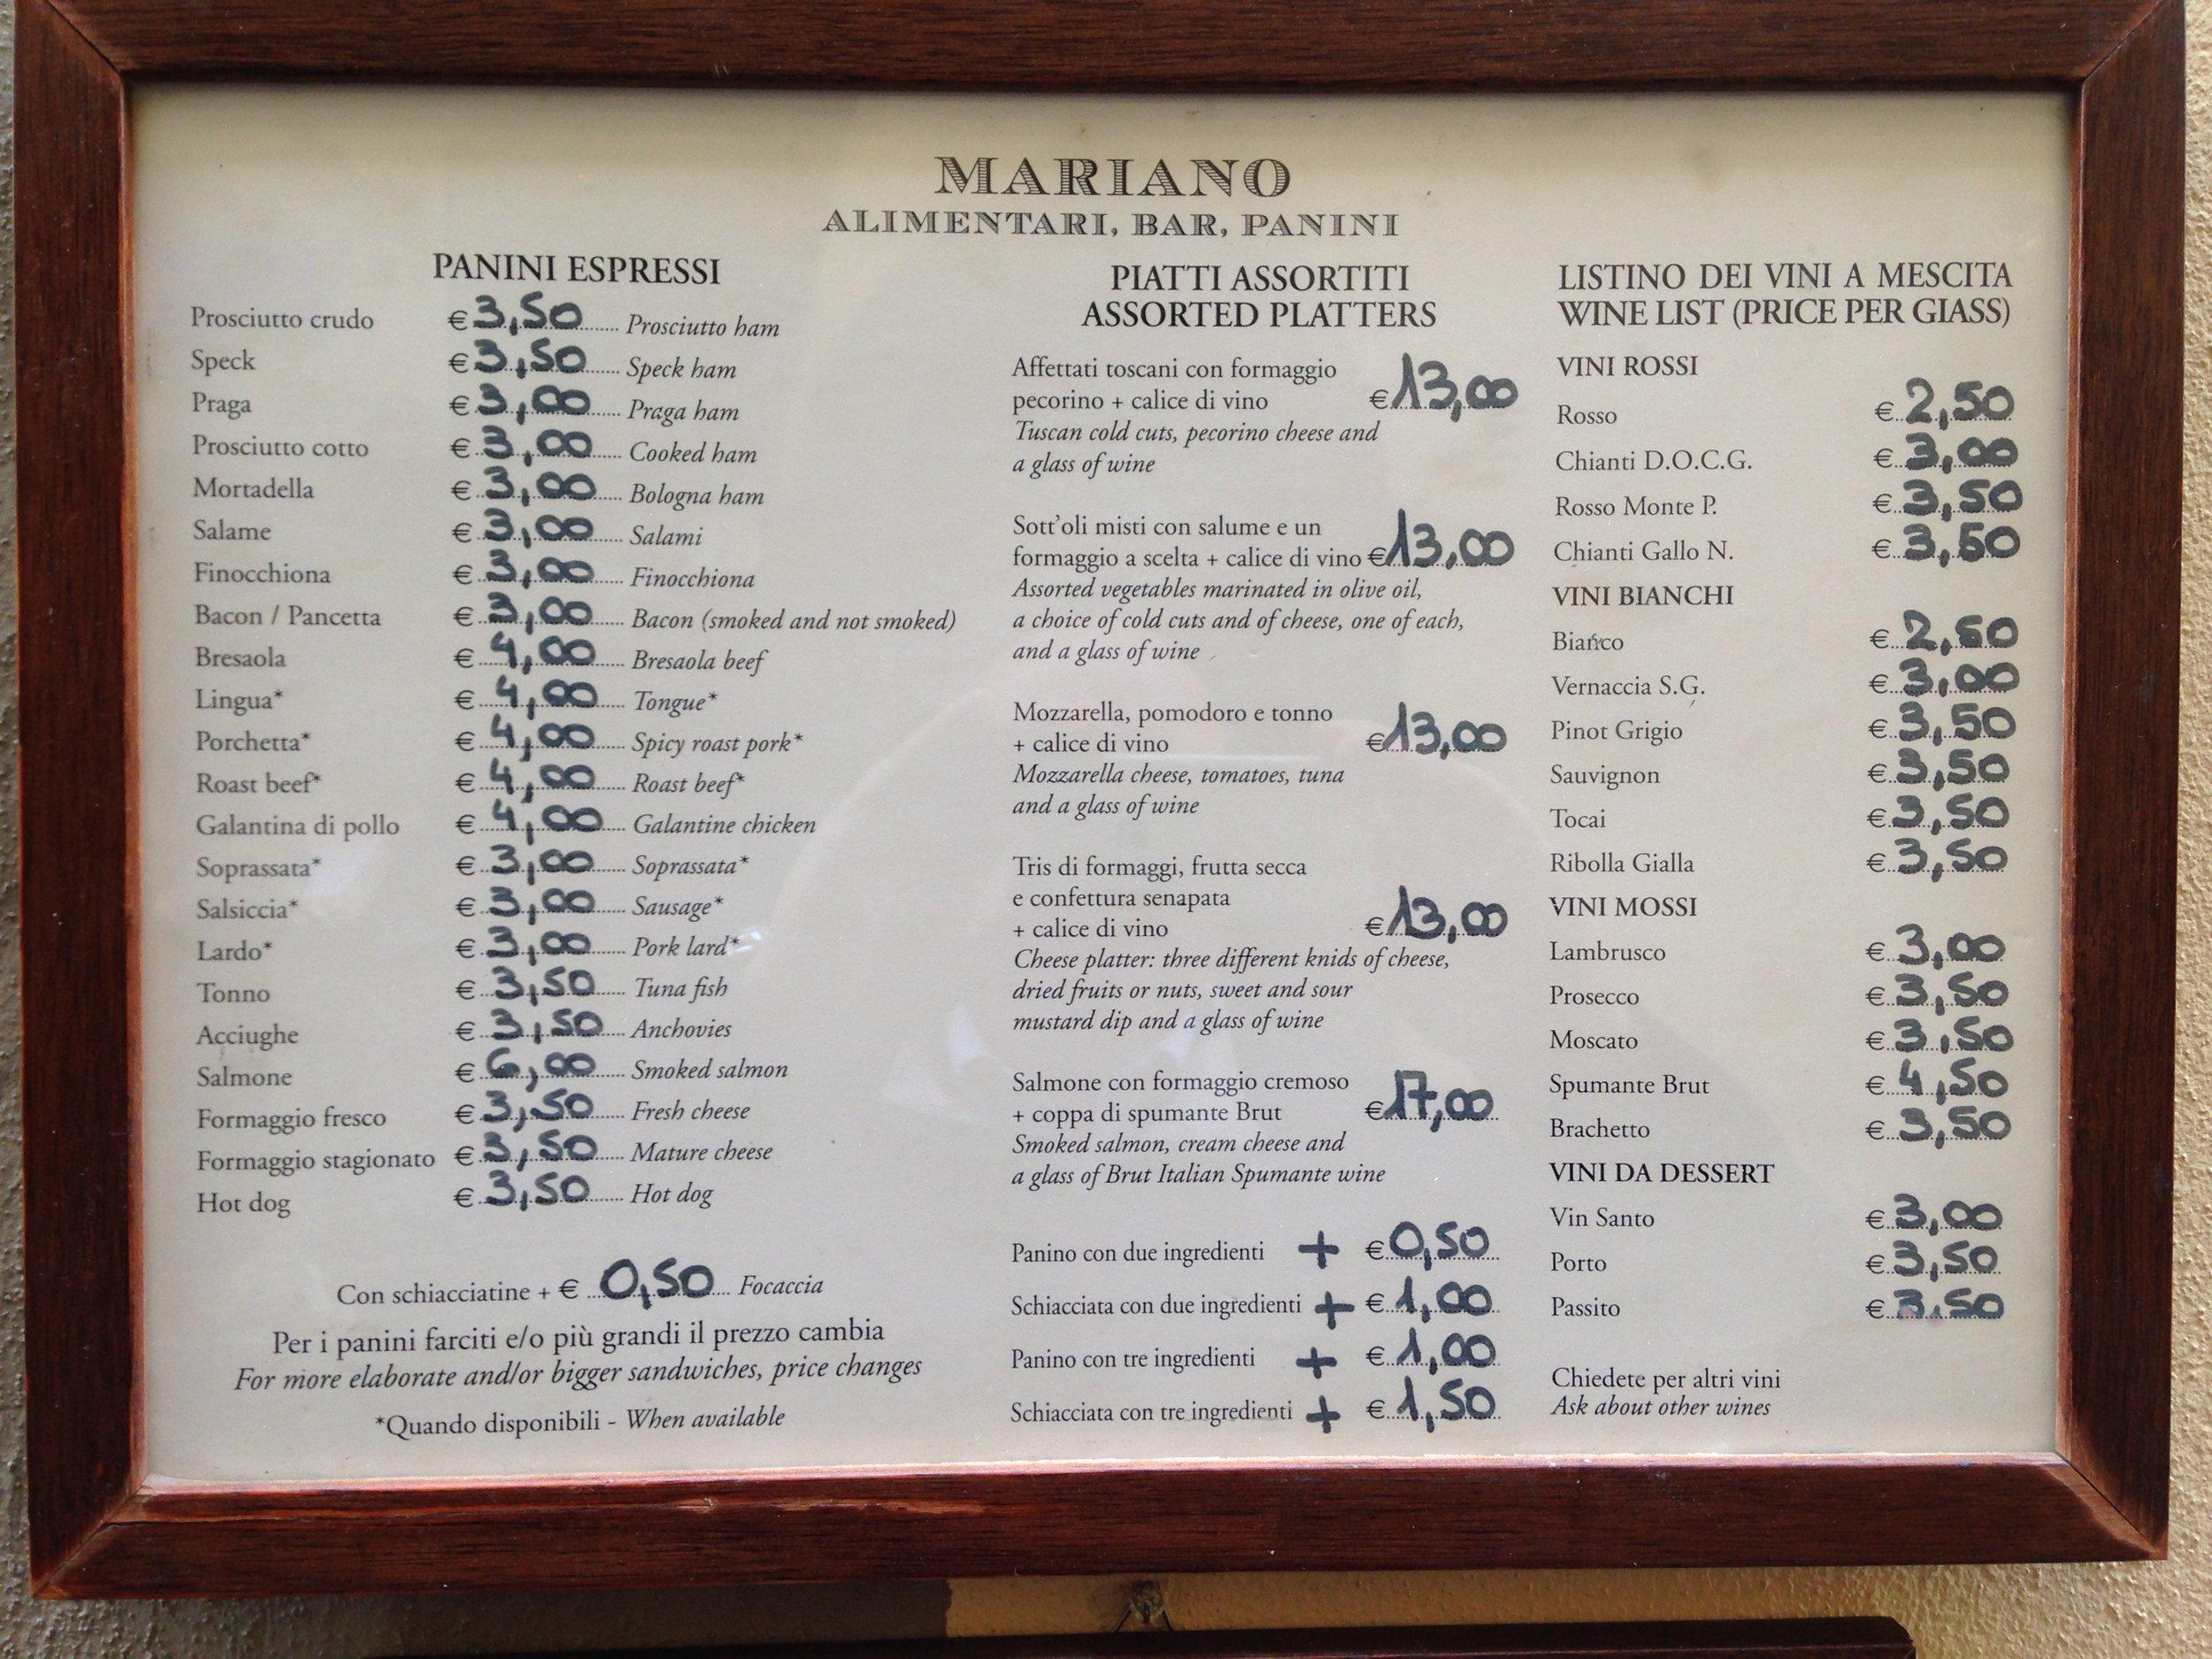 Alimentari Mariano, via del parione, 19r